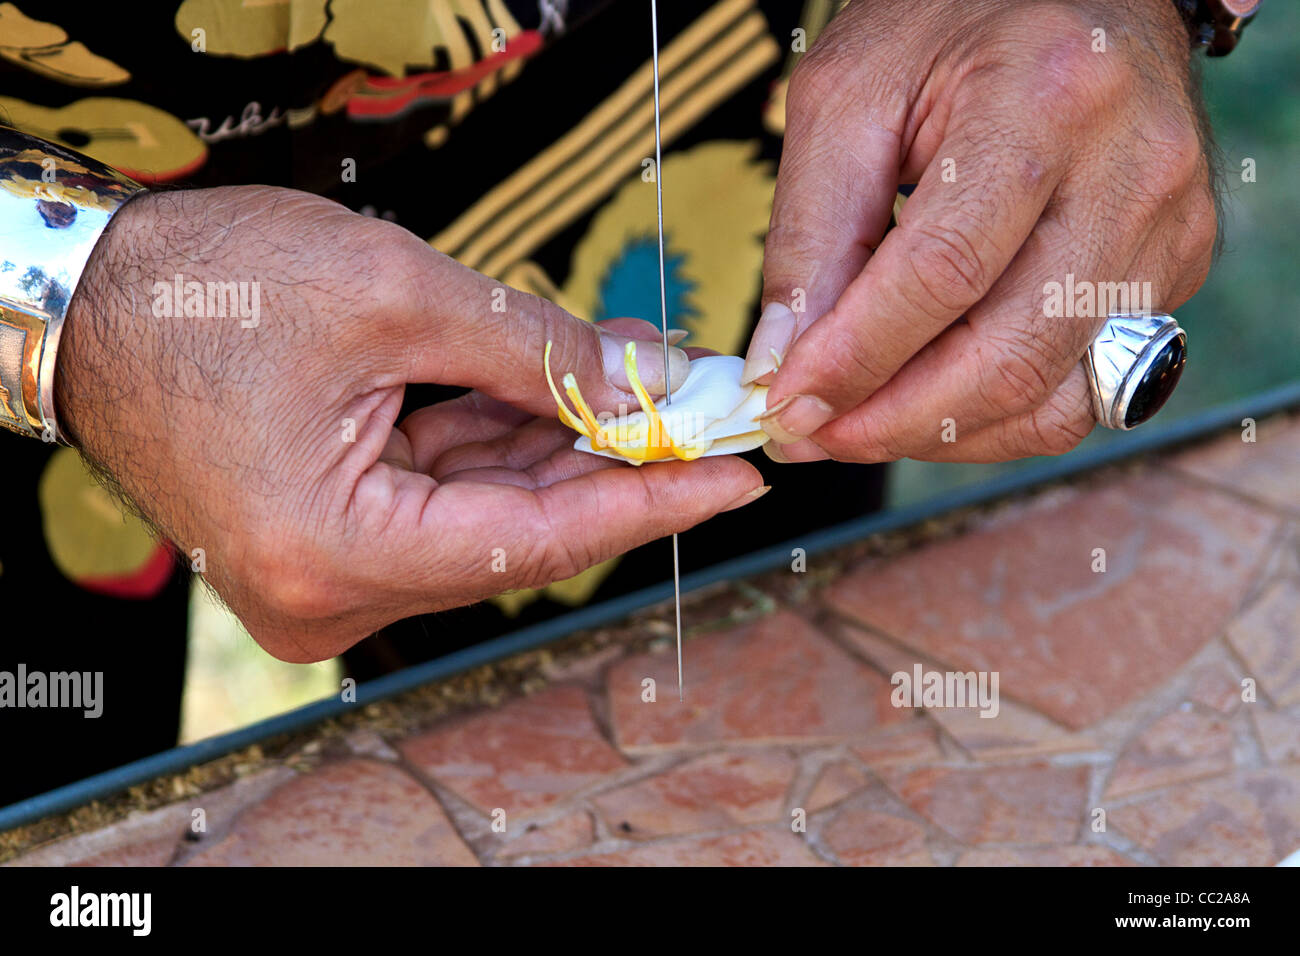 Closeup of local man stringing plumeria (frangipani) flowers to make a lei on Molokai, Hawaii, USA. Stock Photo